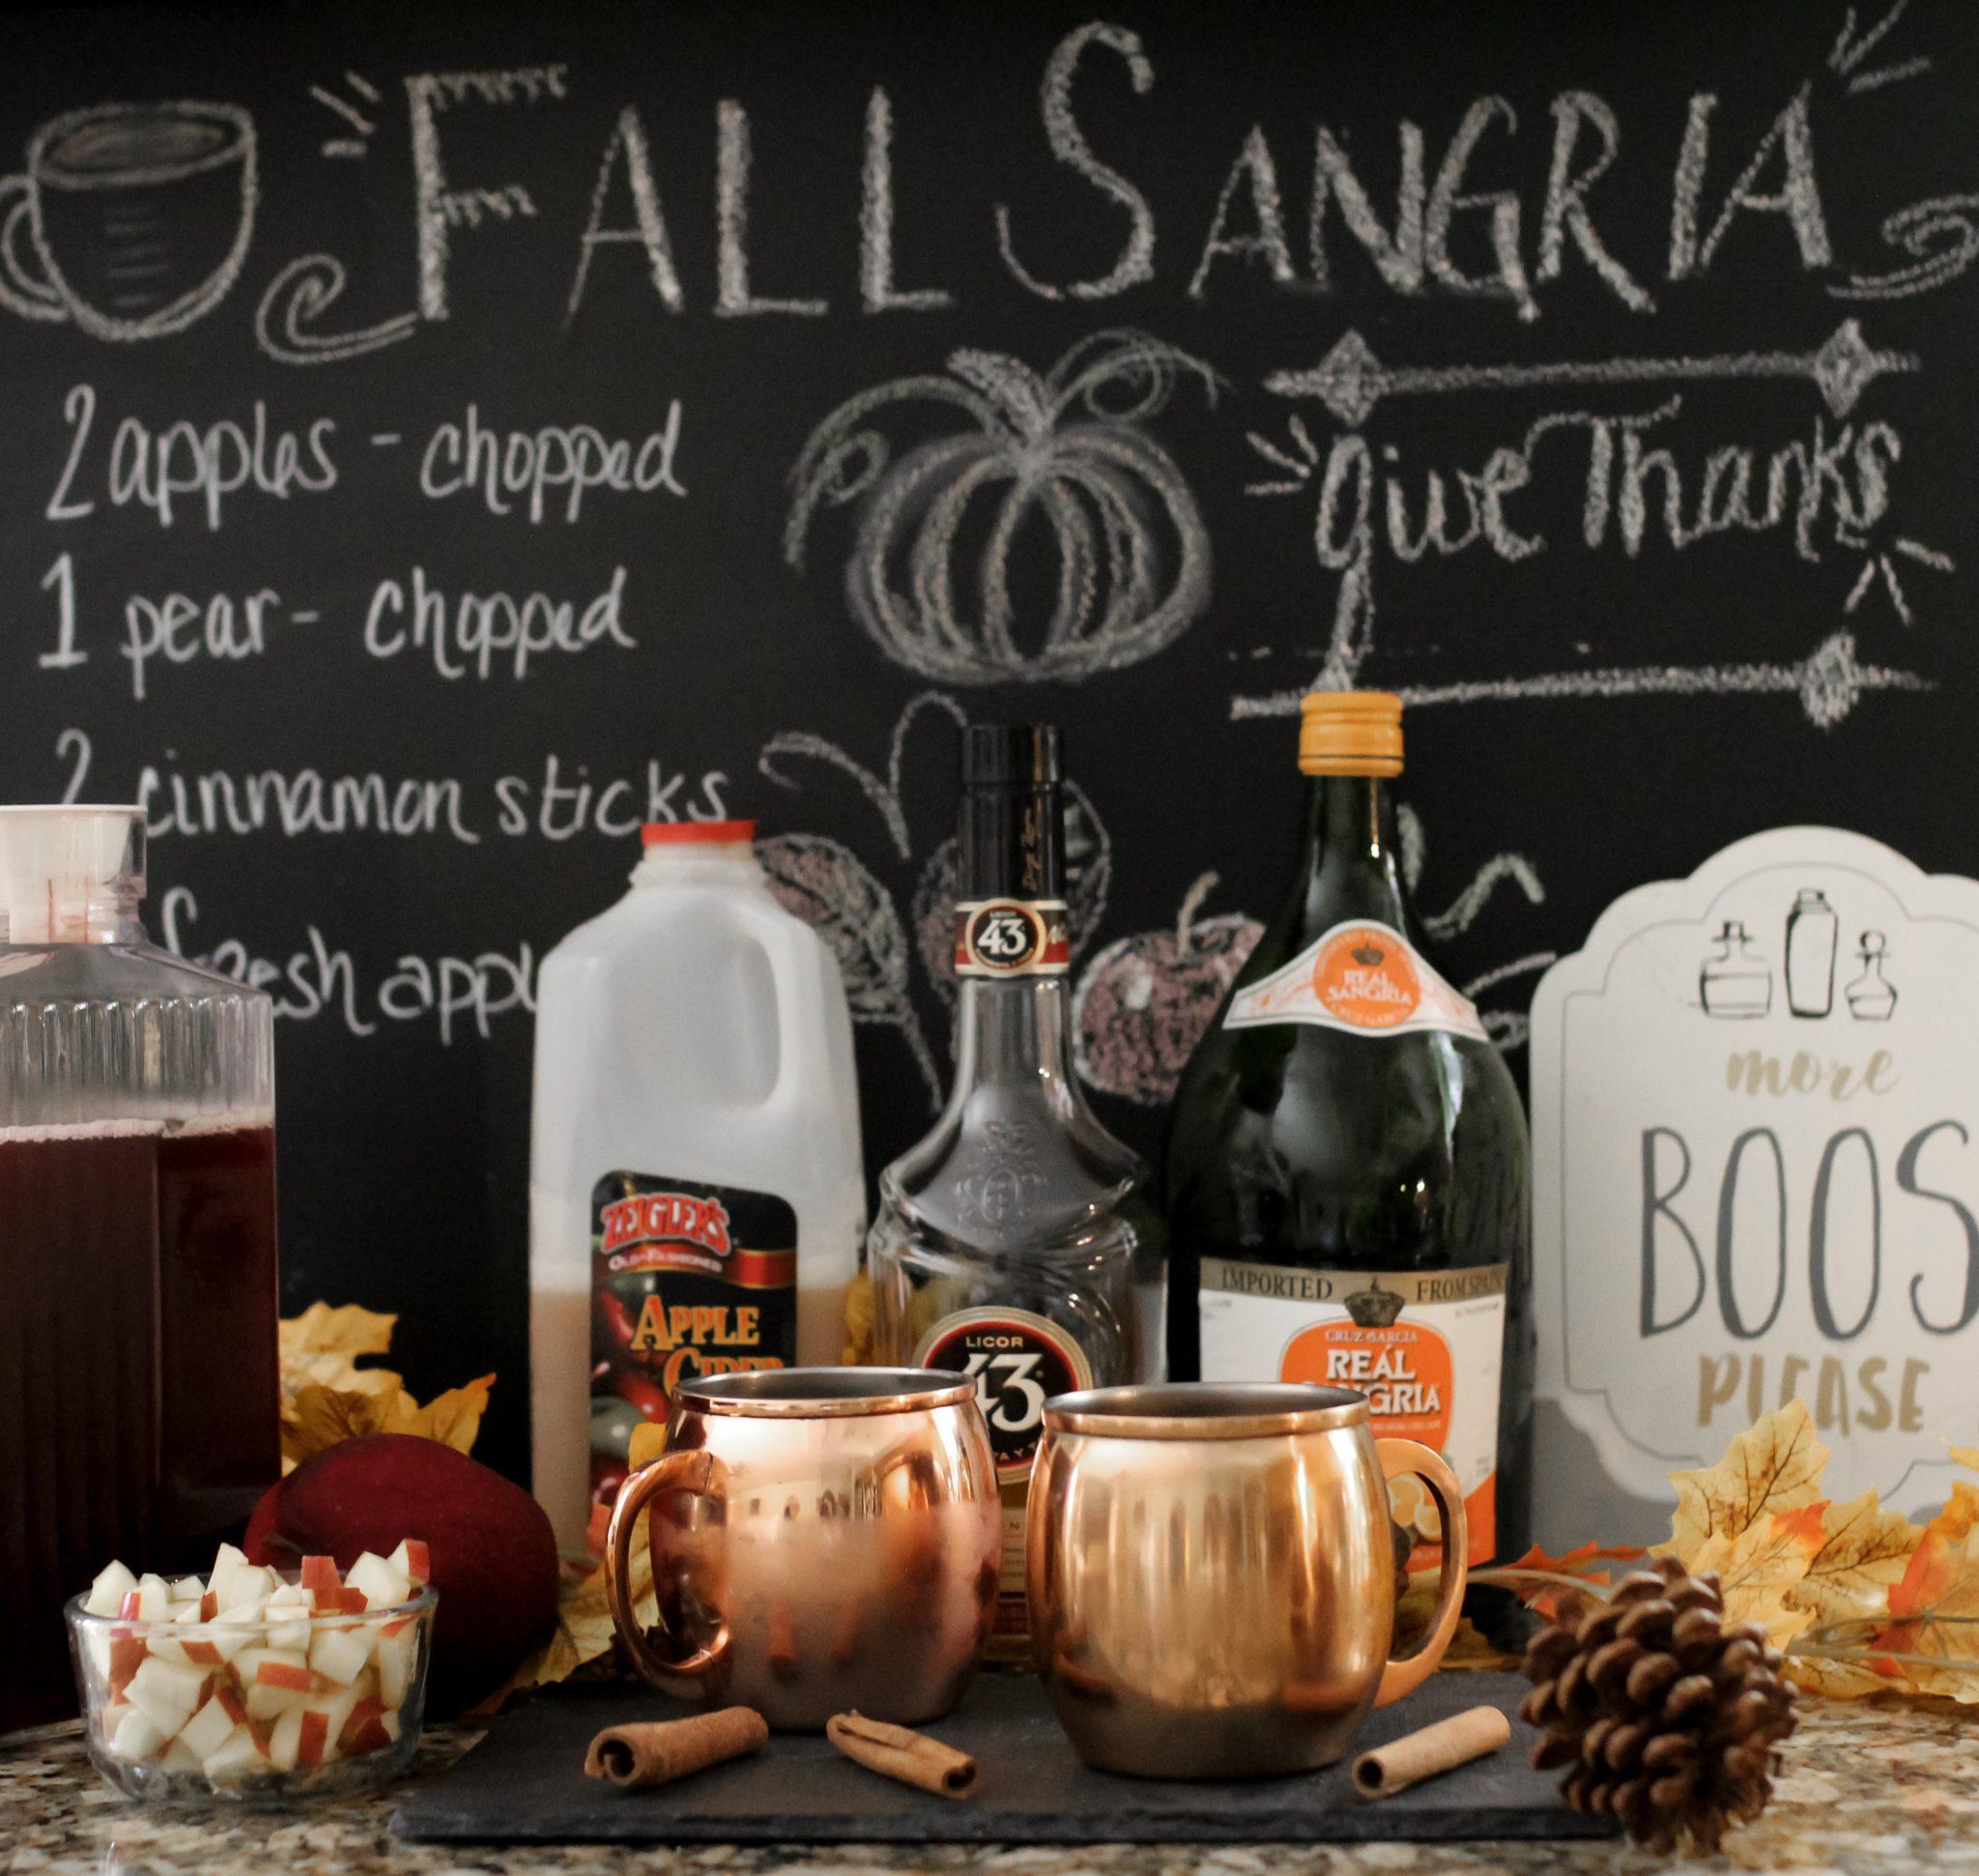 fall sangria with apple cider, honeycrisp apple sangria, fall sangria fireball, fall sangria tasty, apple cider sangria with moscato, white wine apple cider sangria, autumn sangria azalea, white apple sangria